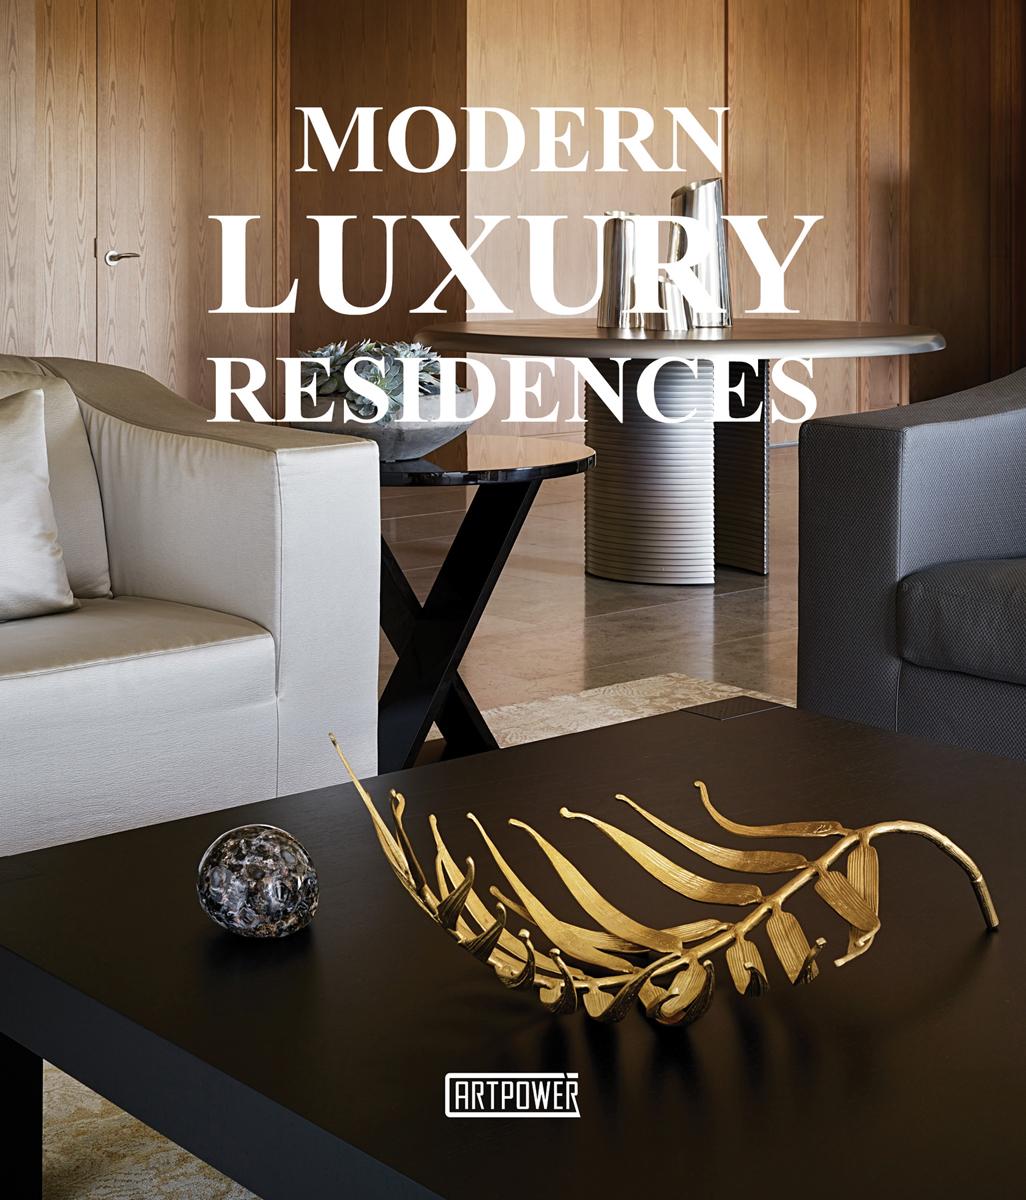 Modern Luxury Residences